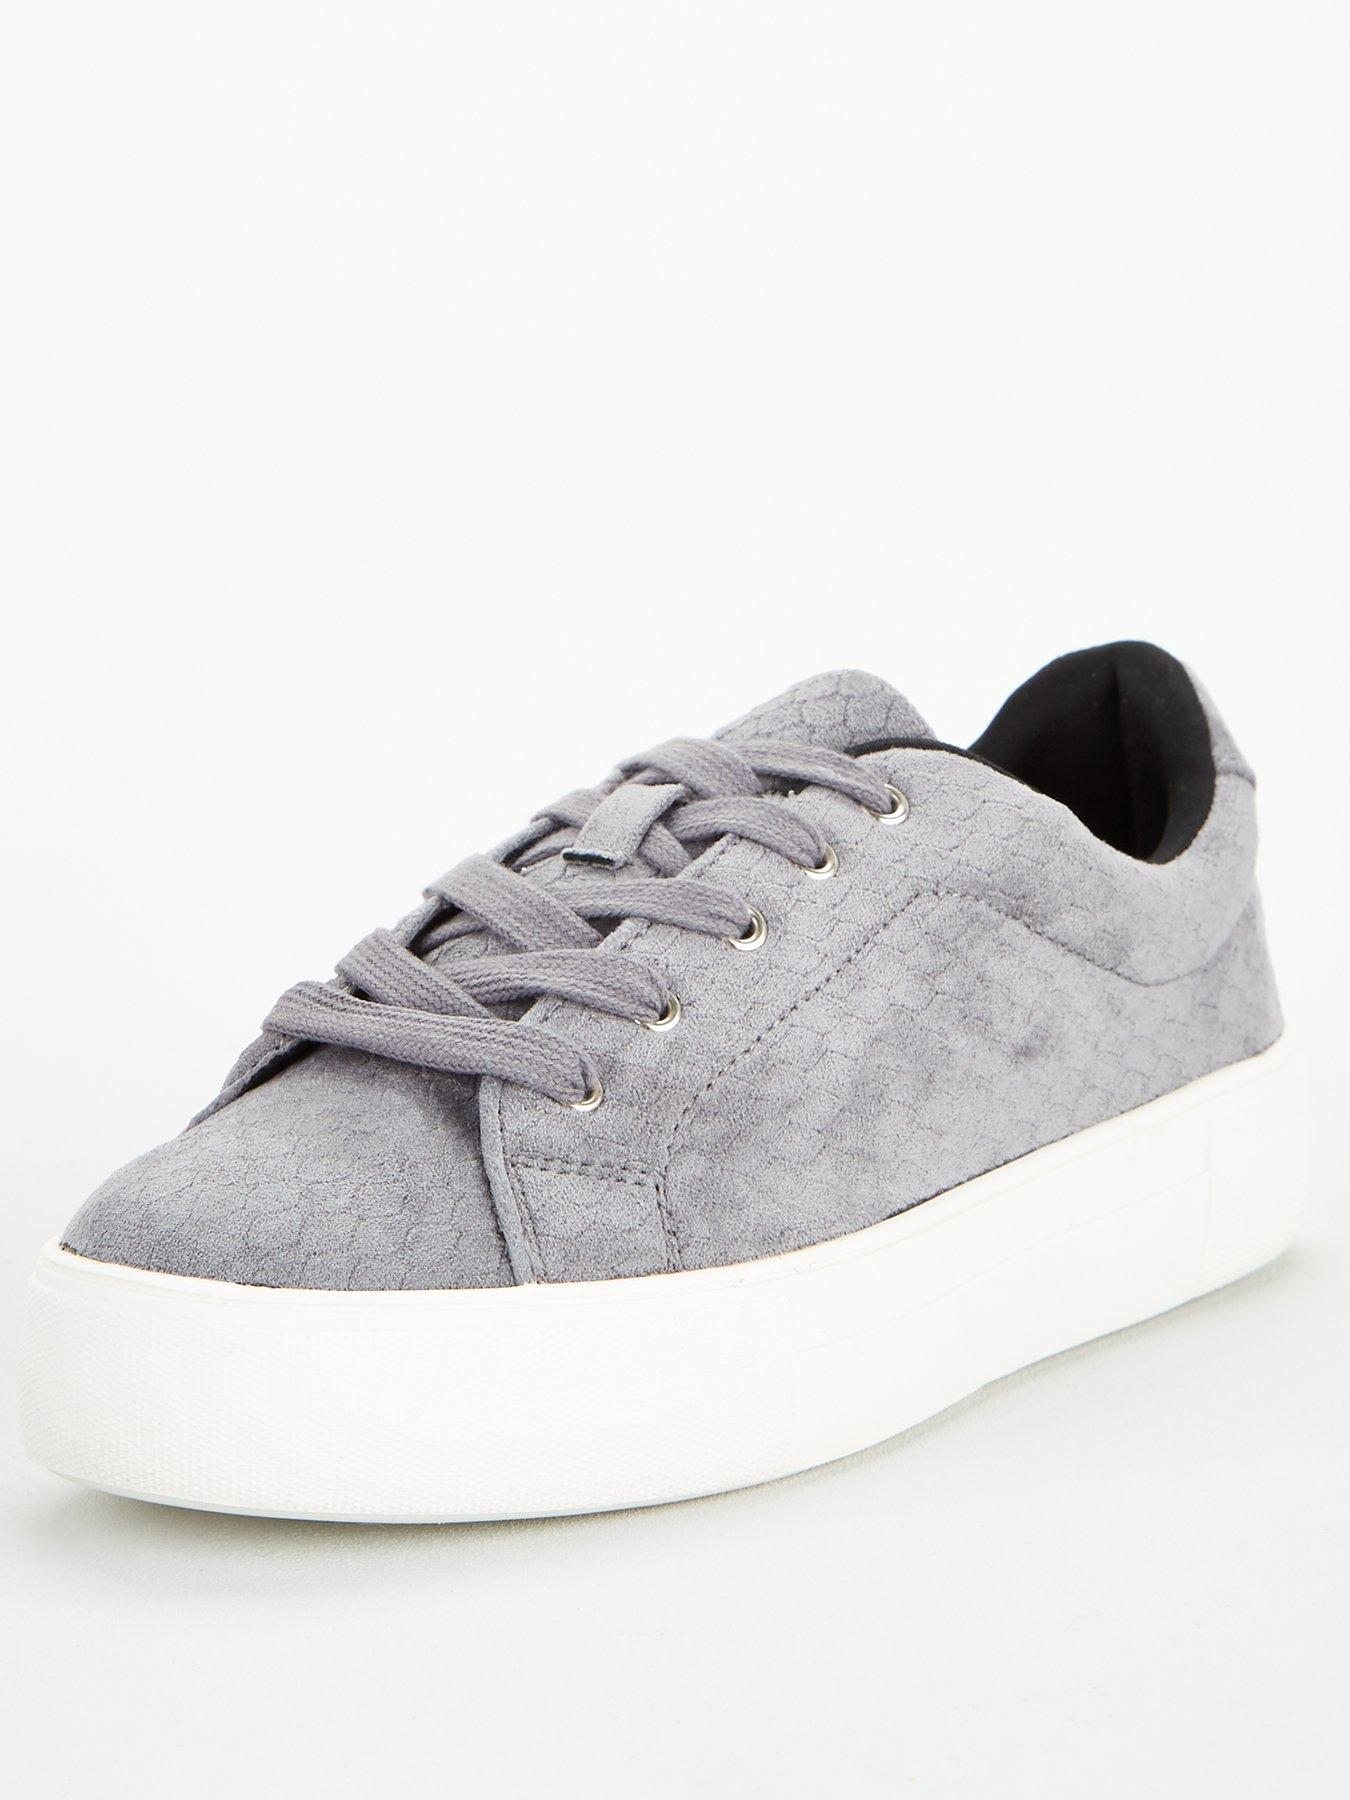 Shoes, Runners \u0026 Trainers | Women